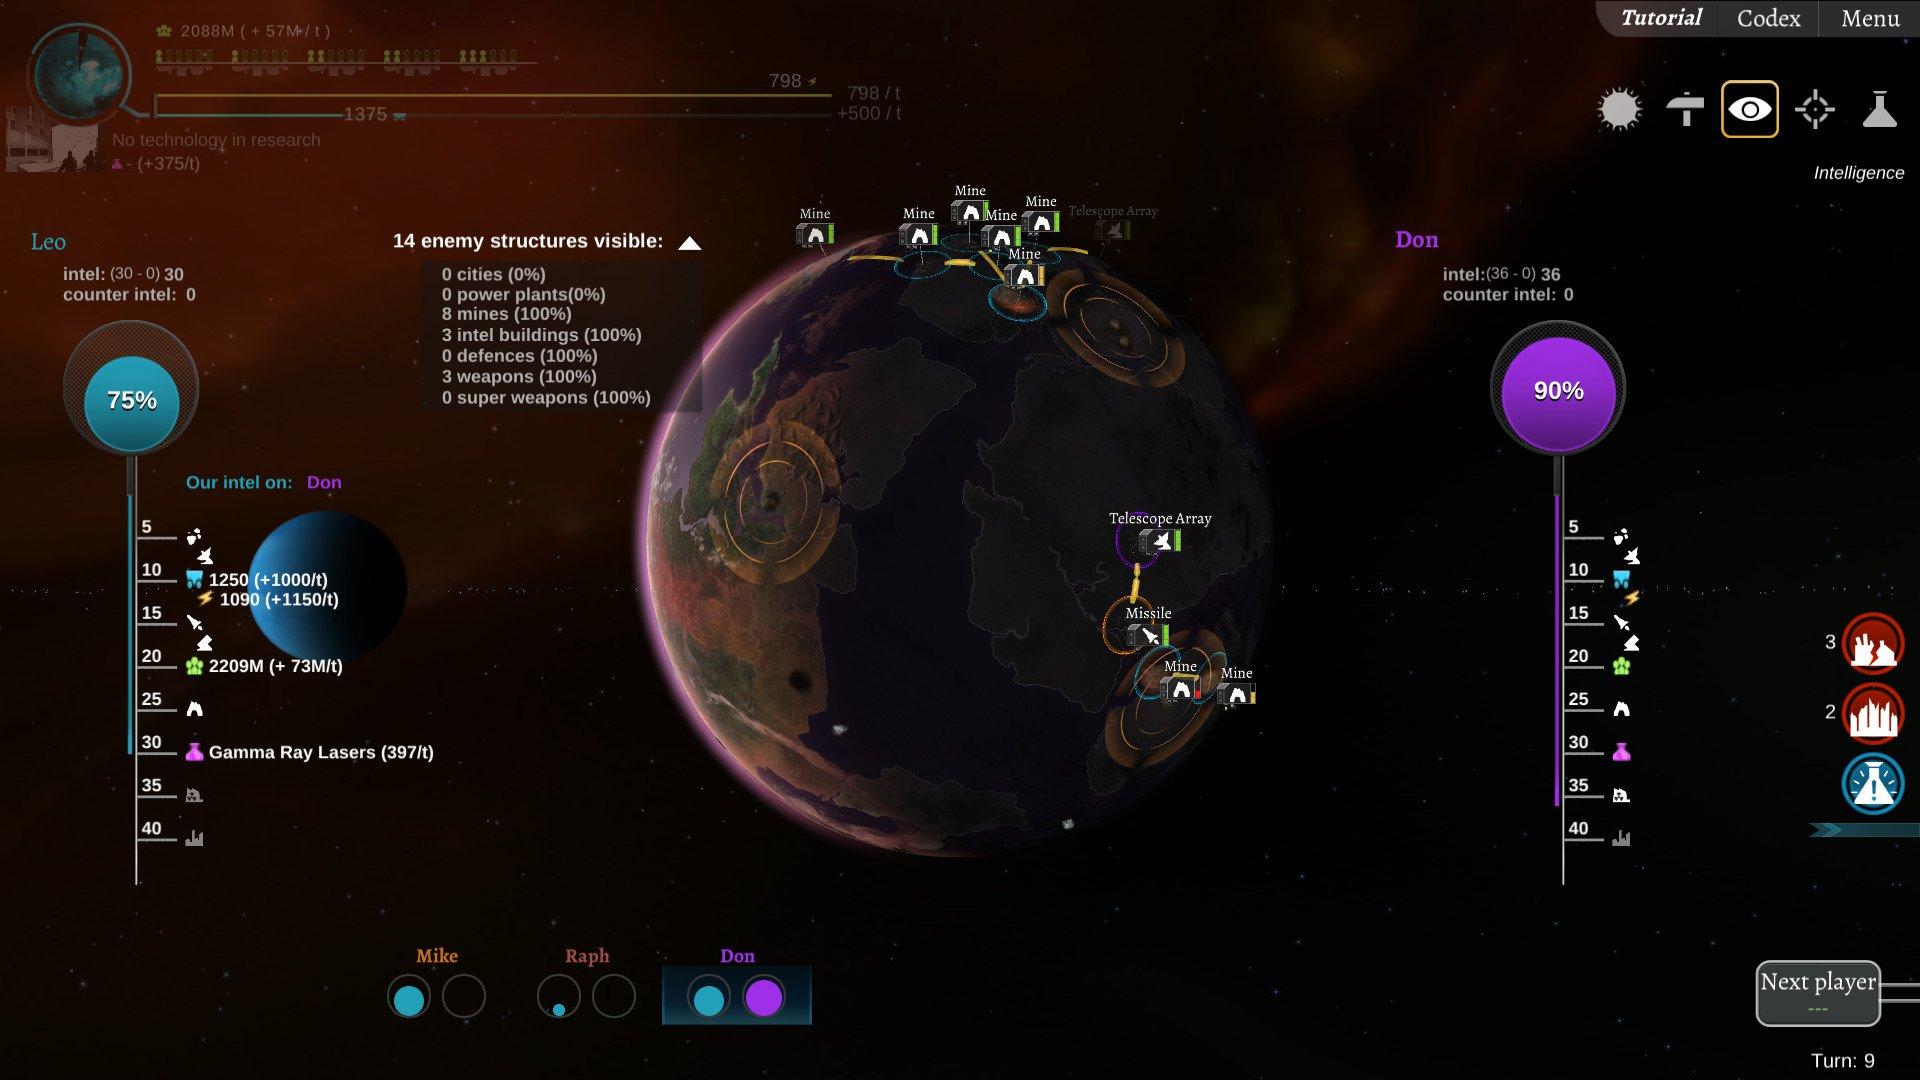 Interplanetary 16